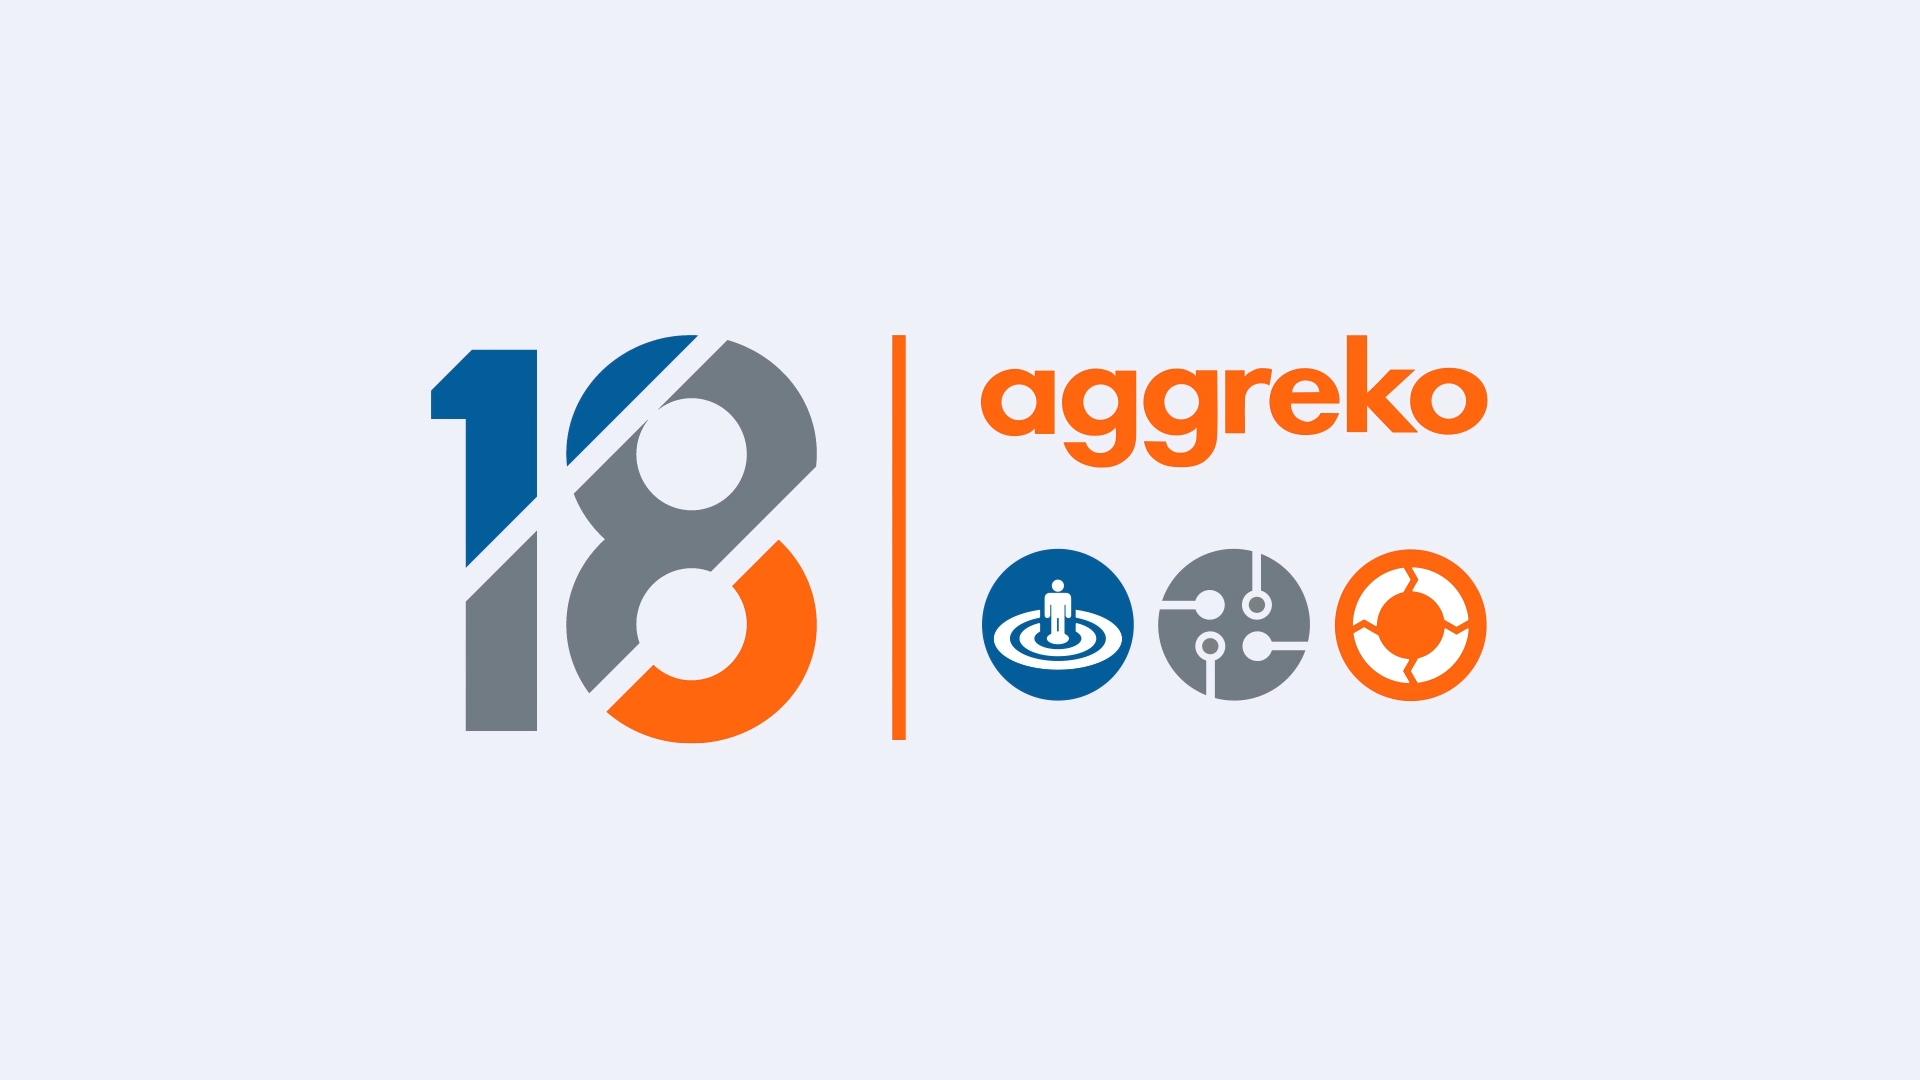 CapgeminiAggreko_01